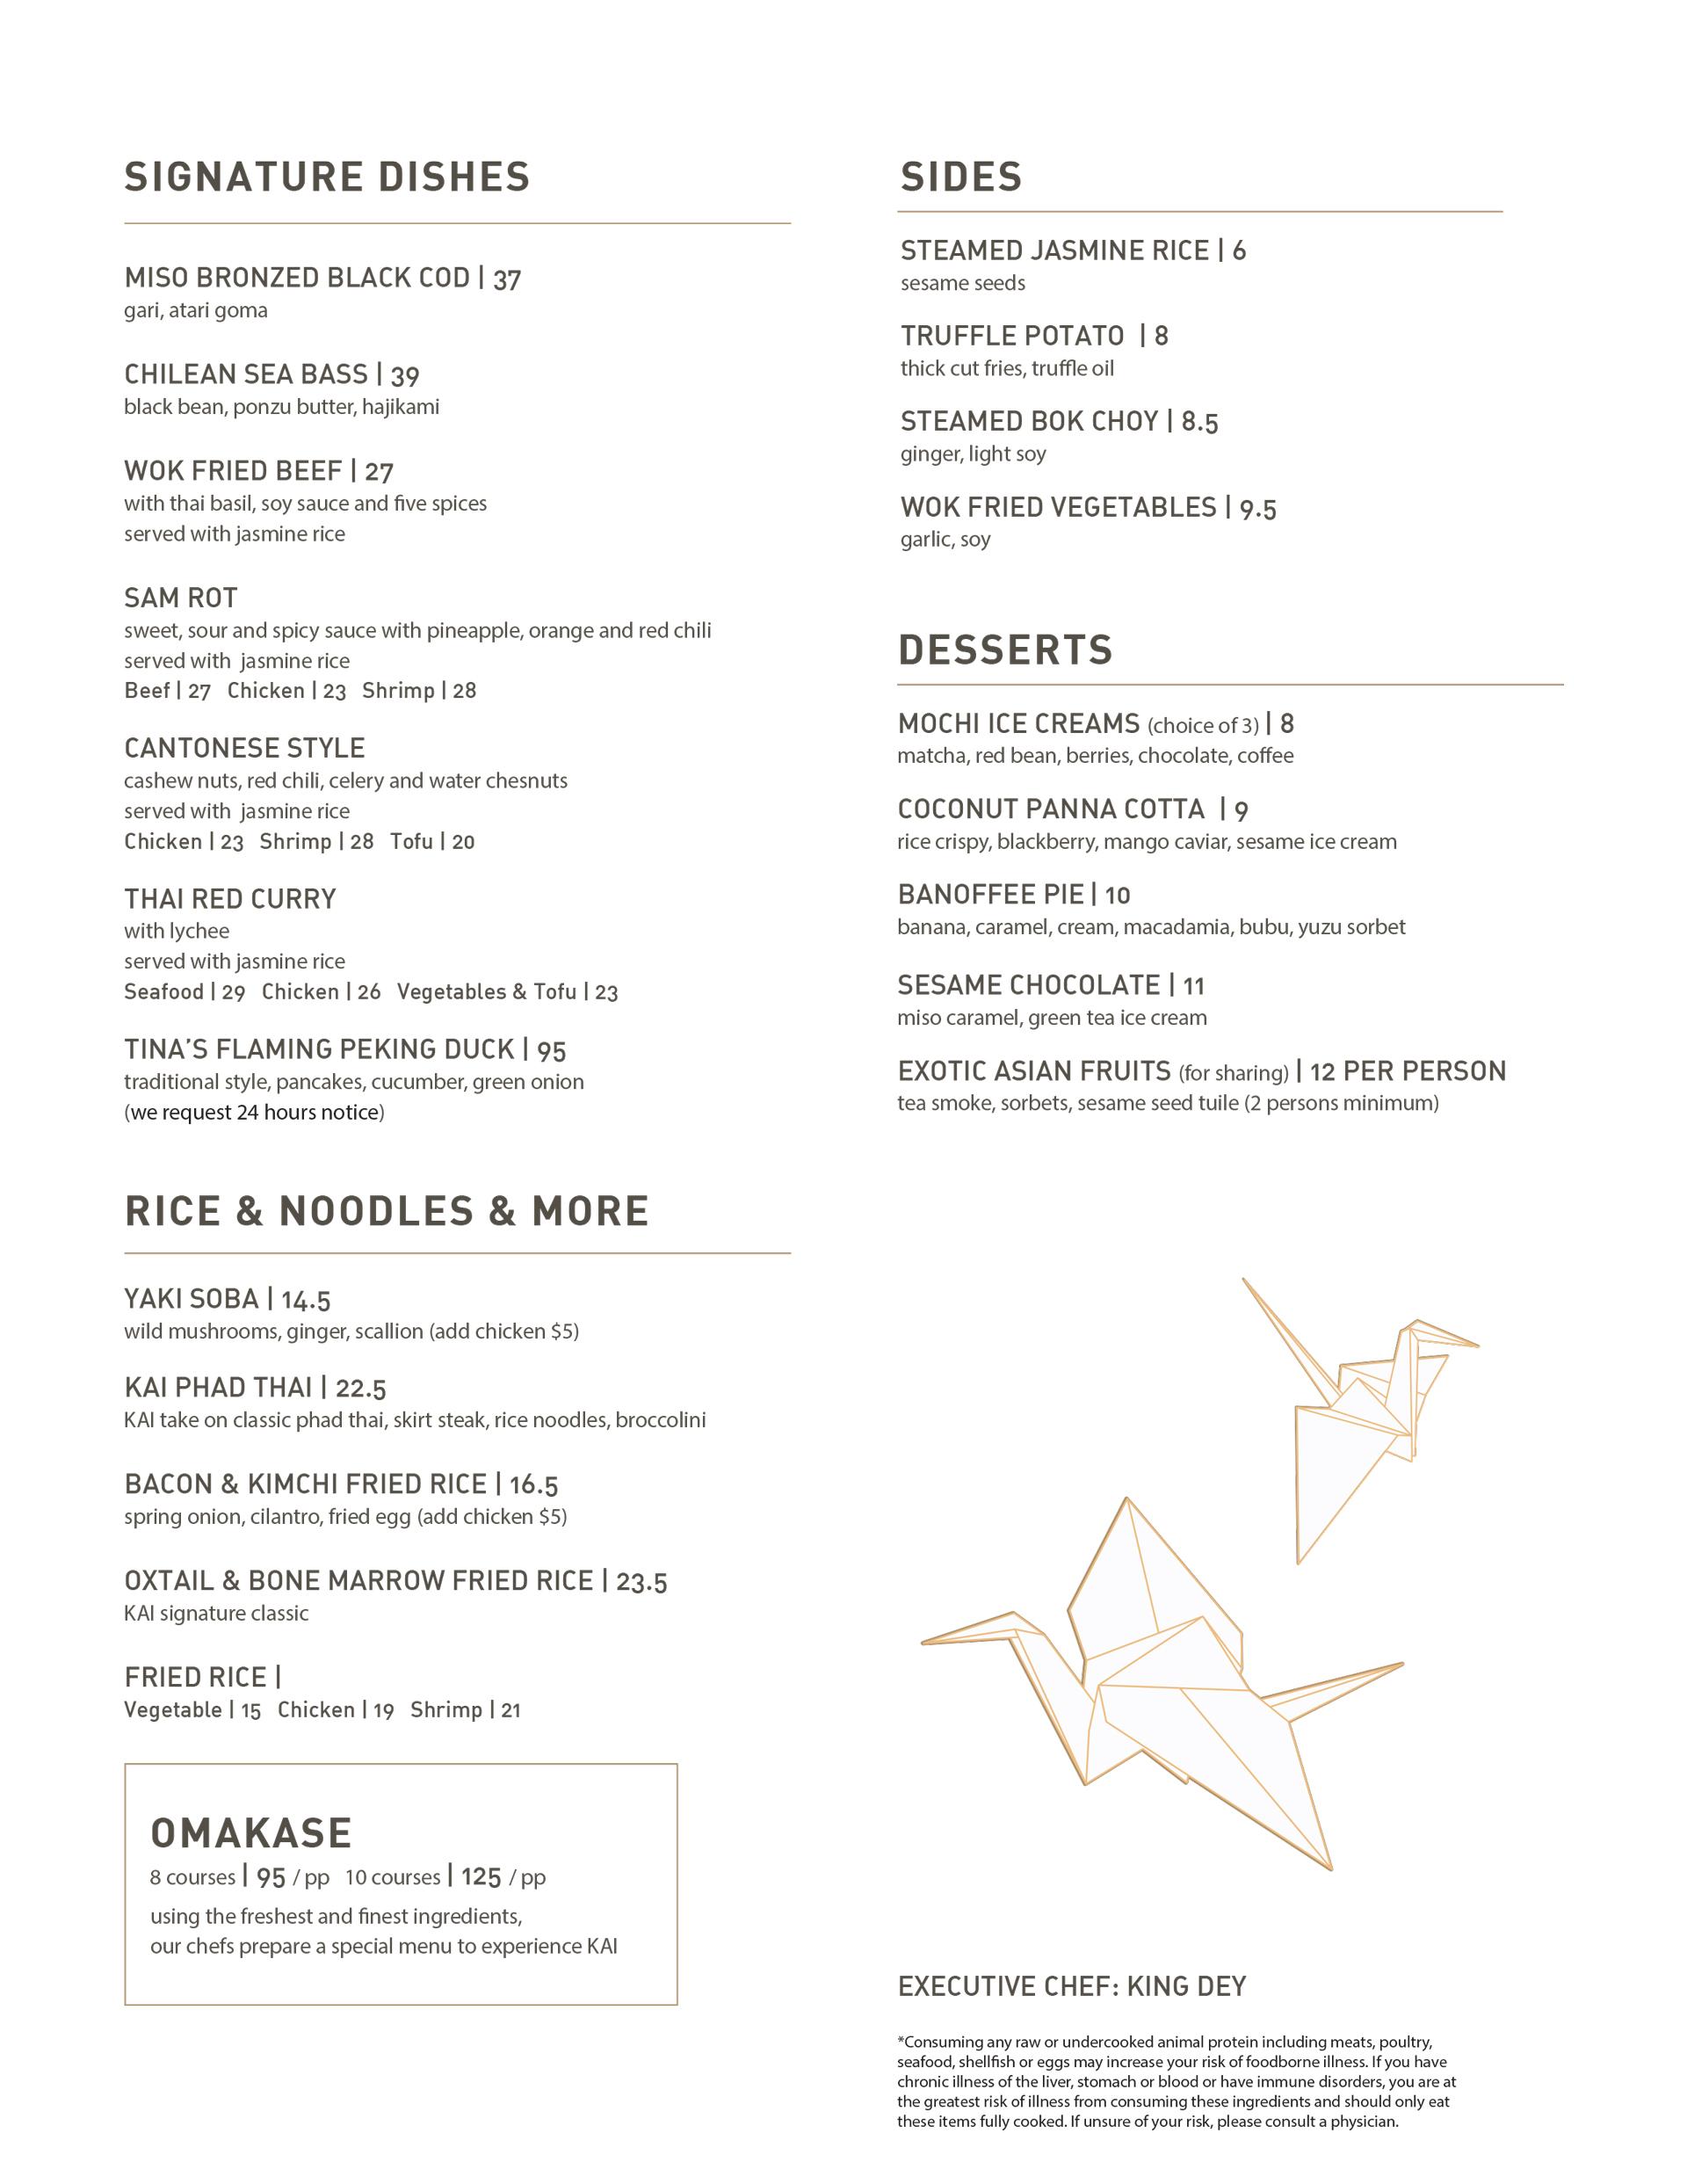 KAI-Dinner-Menu-6.28.19-3.jpg